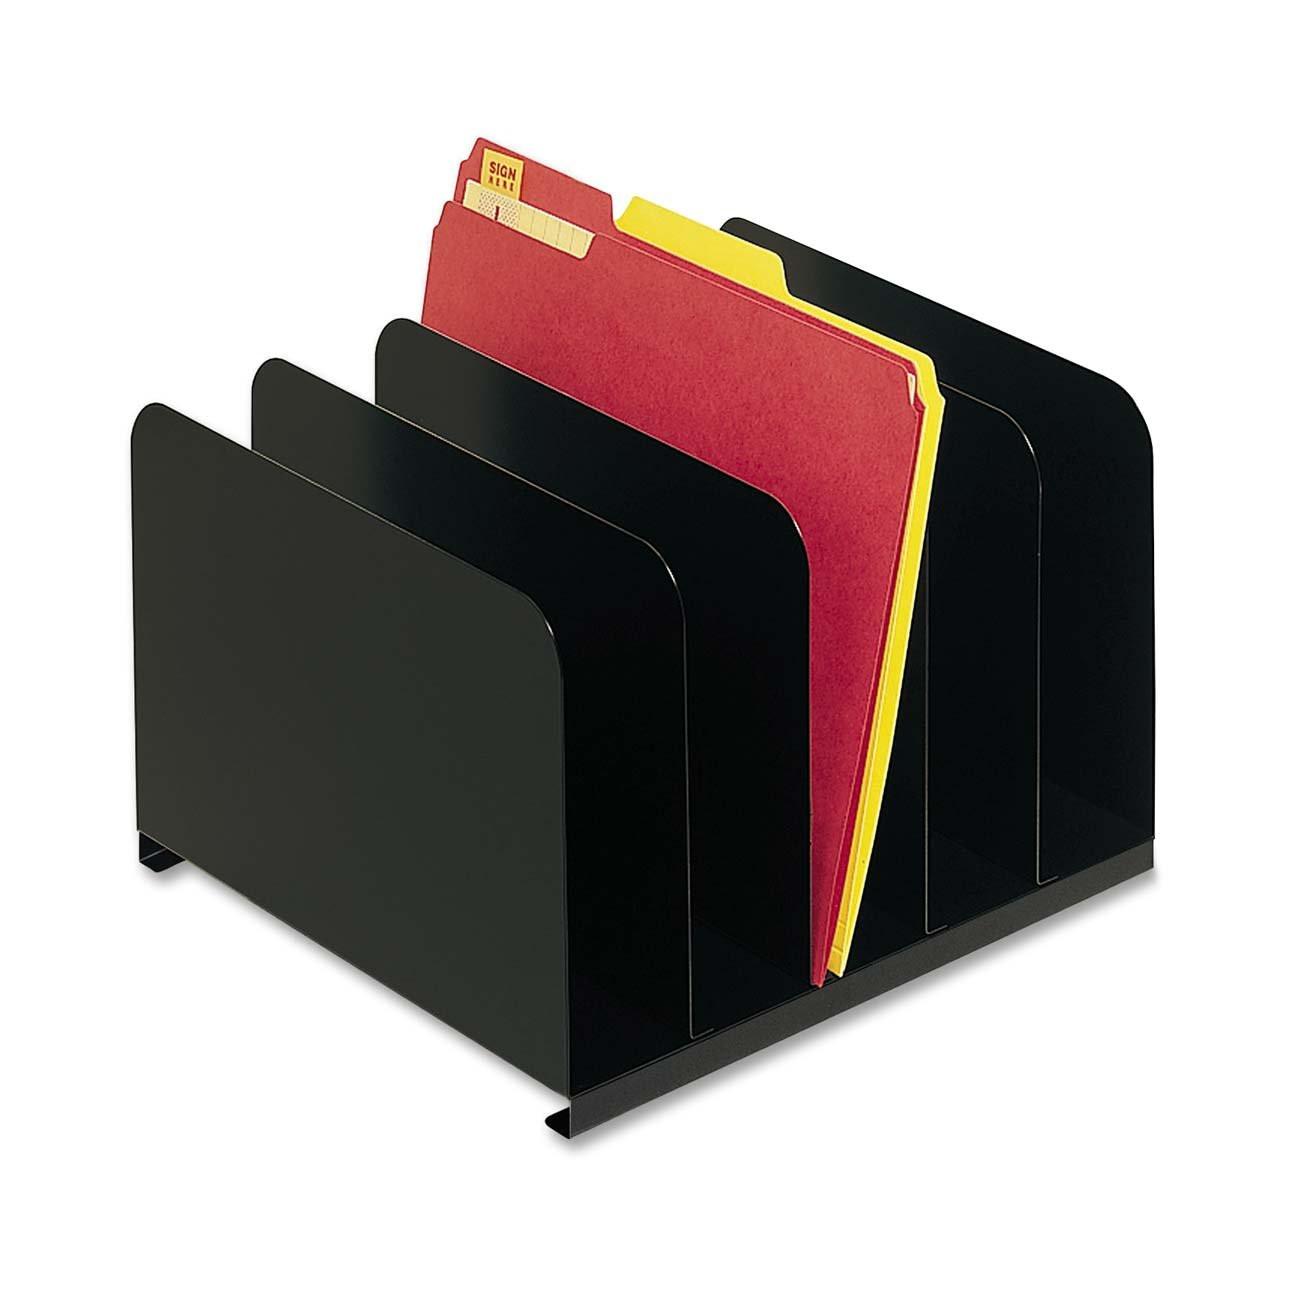 Desktop File Folder Organizer  MMF Industries Steel 5 partment Vertical Desktop File